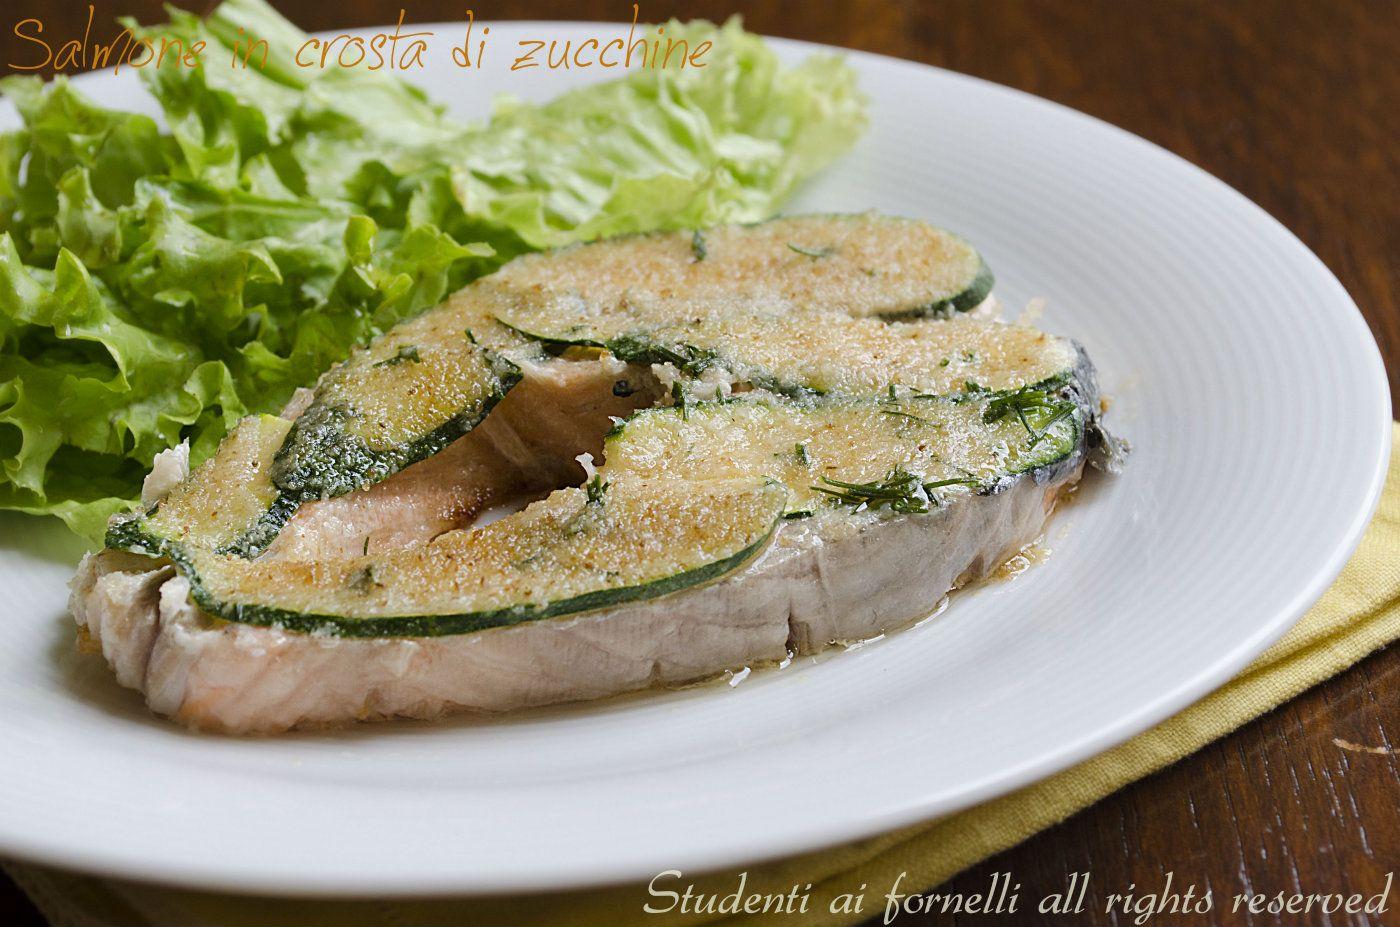 Ricette veloci a base di zucchine